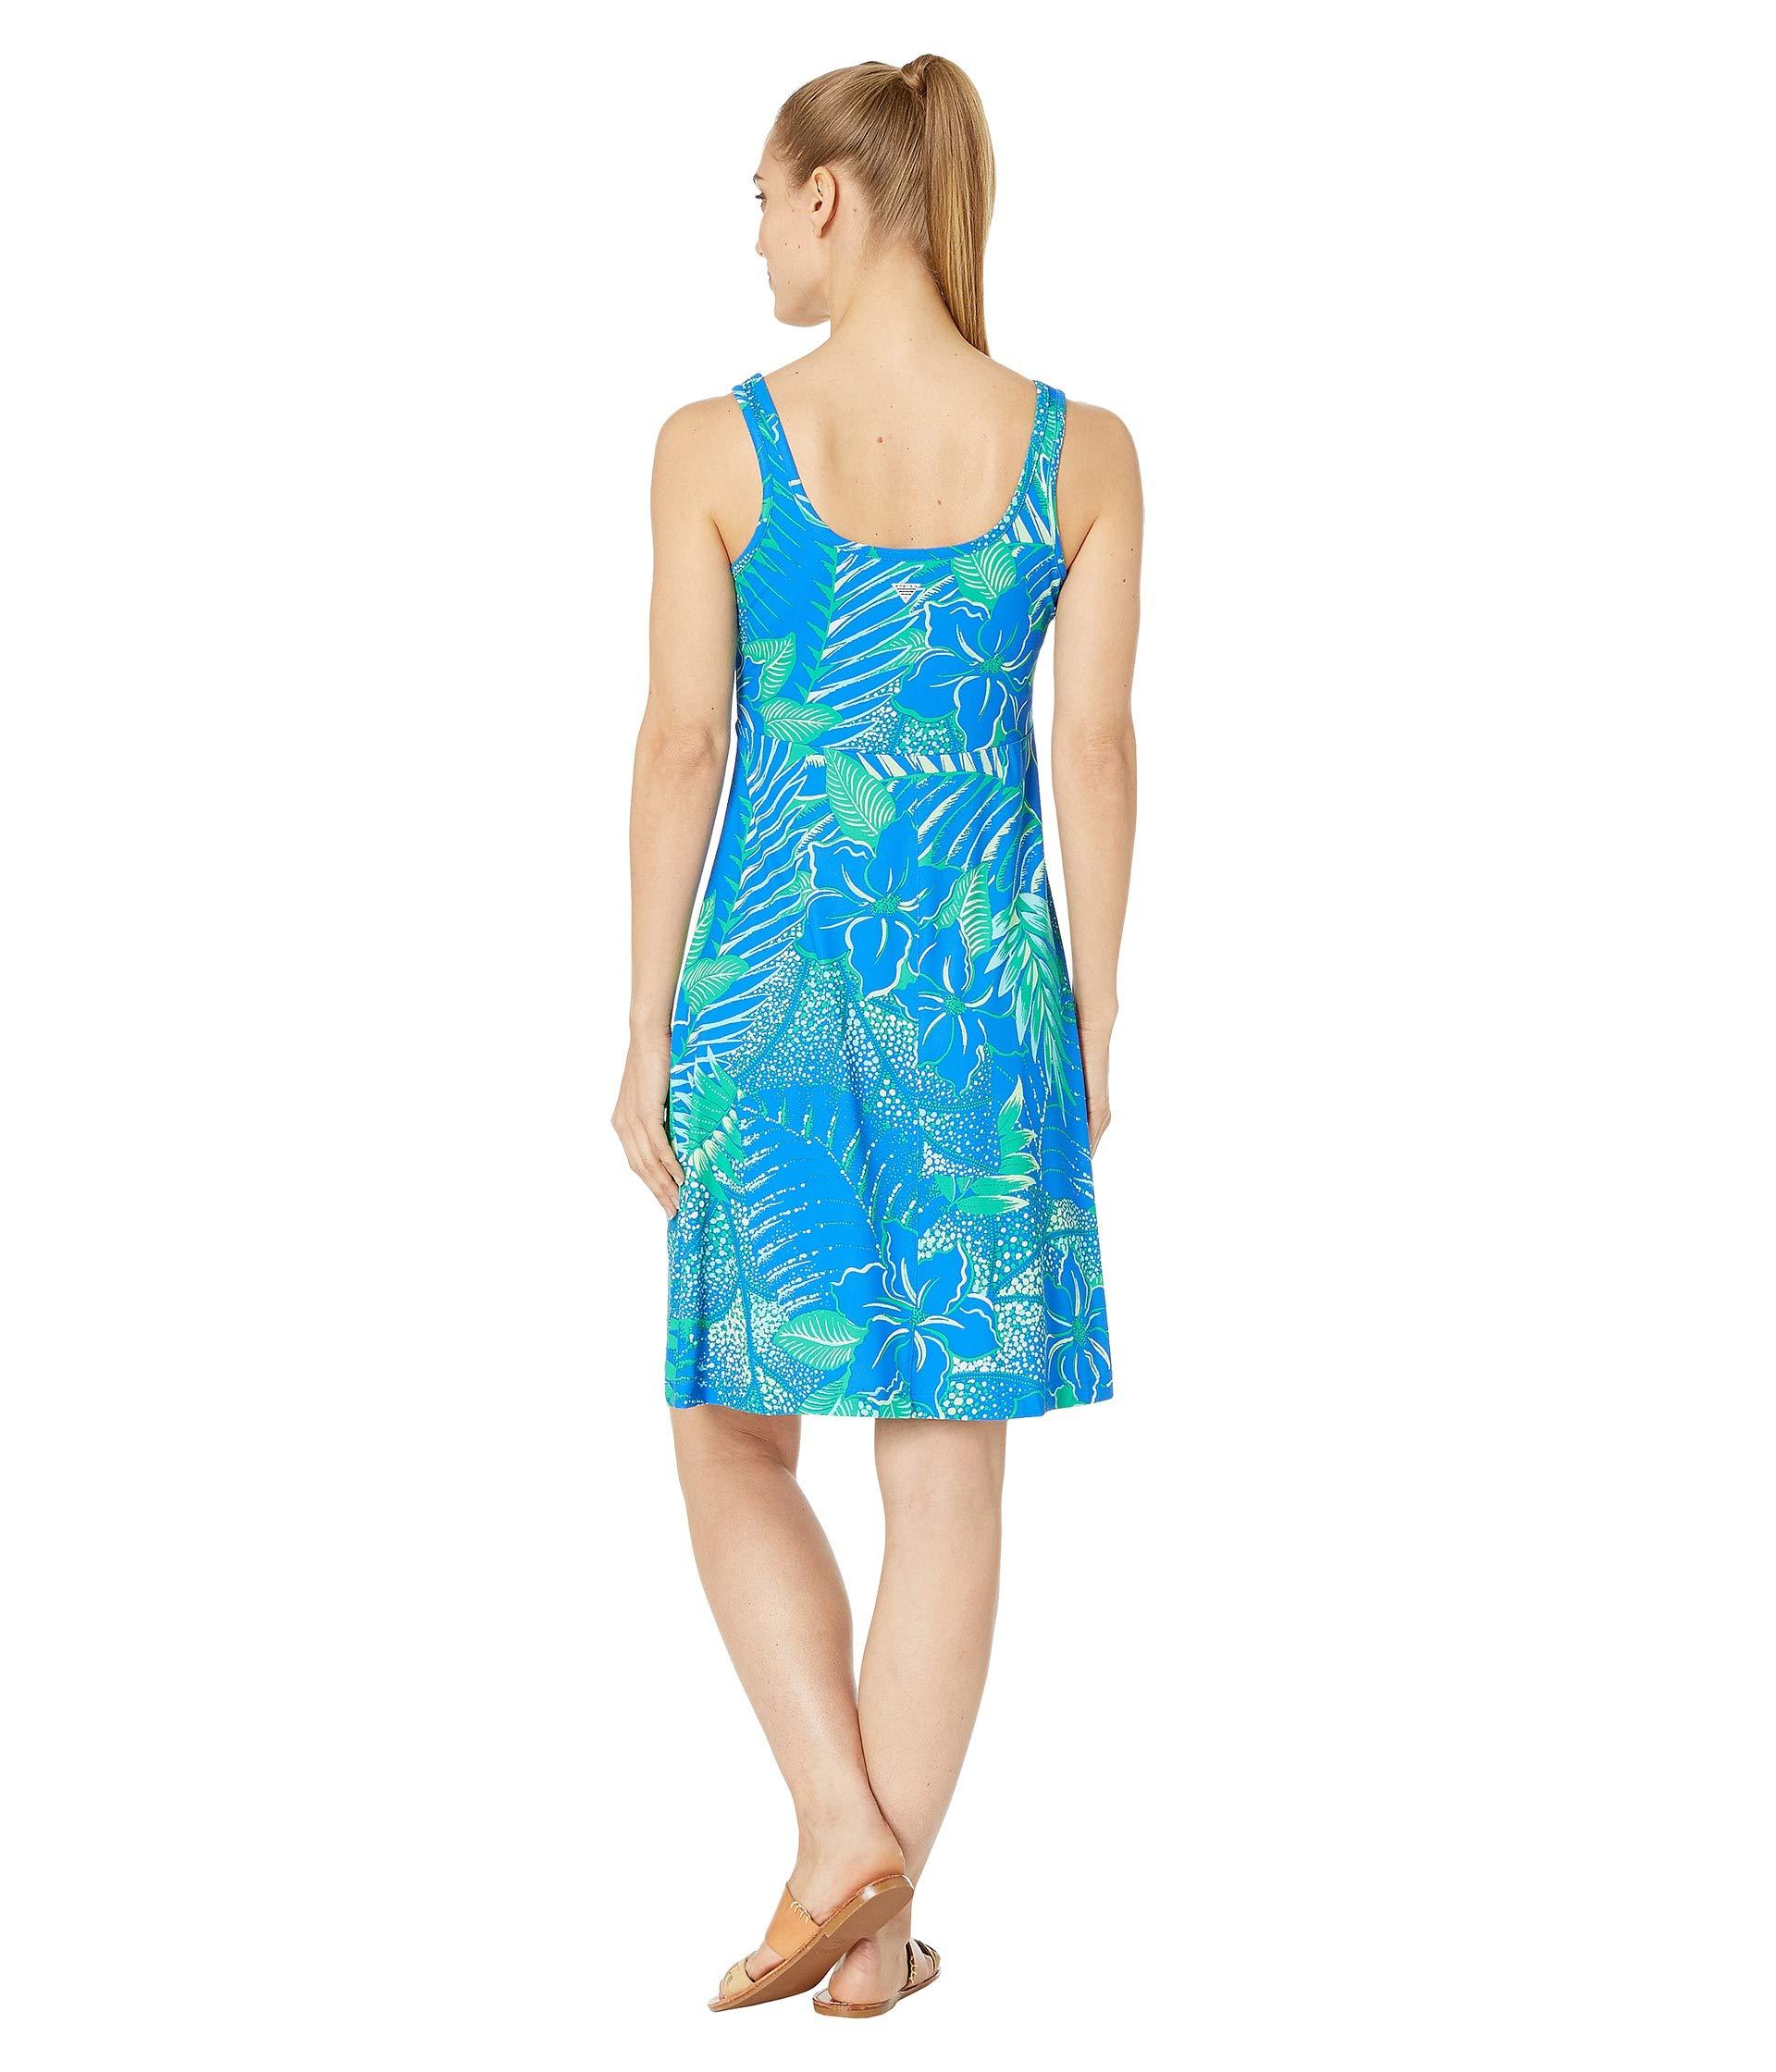 Columbia Iii Dress Blue Freezer™ Macaw Print 11U7Oxn